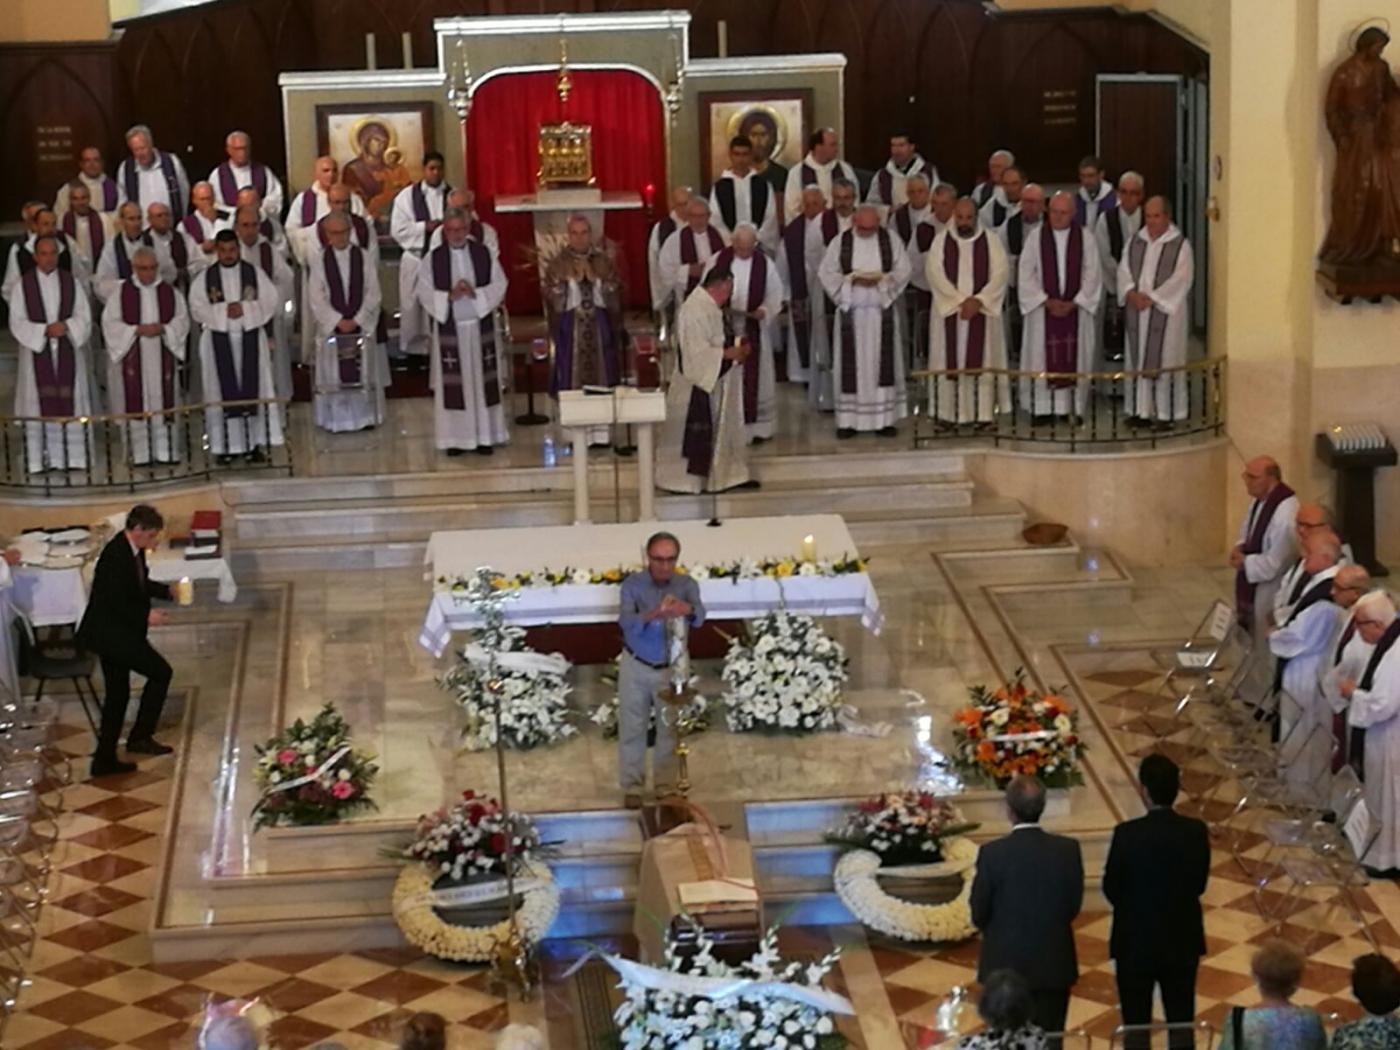 Momento de la Eucaristía córpore insepulto presidida por el Sr. Obispo. FOTO: J. I. TORRES